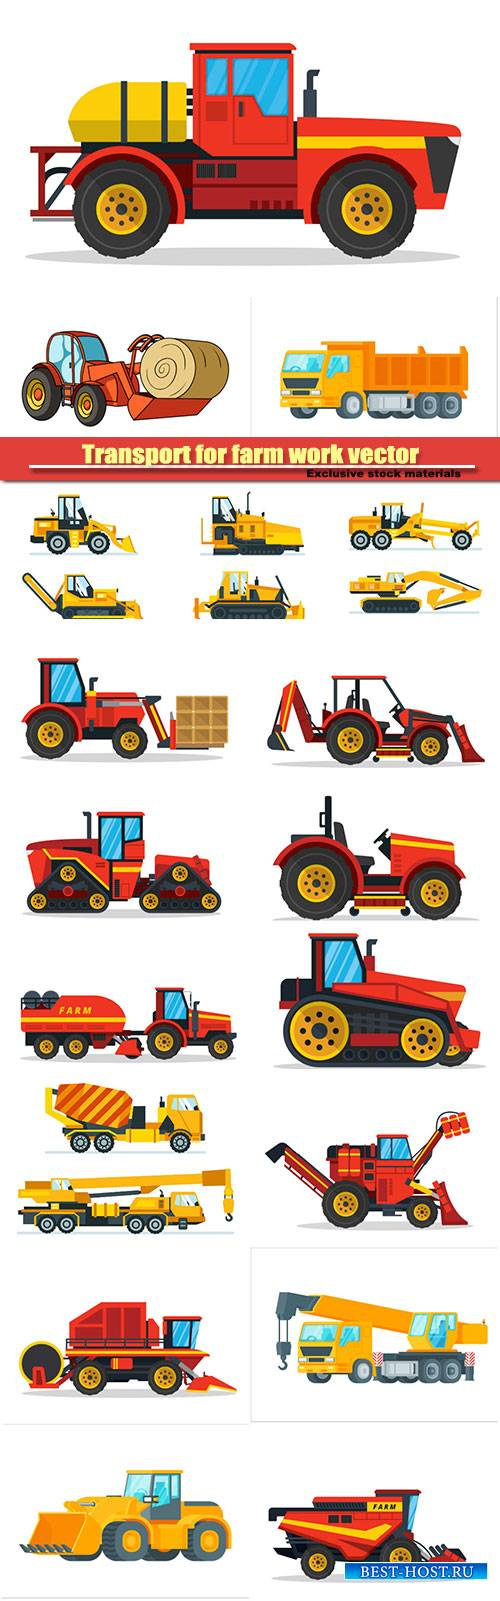 Transport for farm work vector